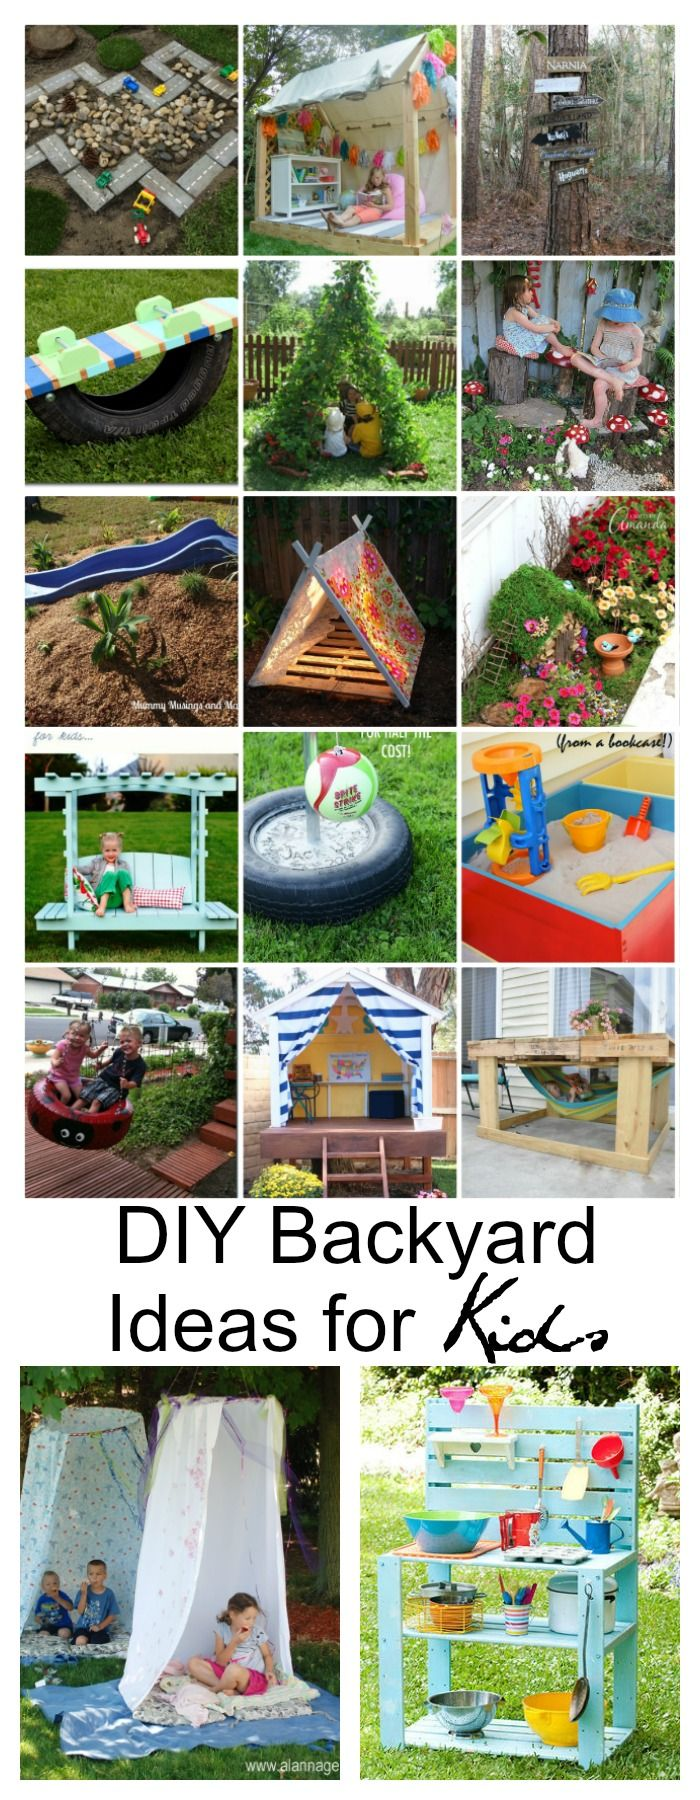 DIY Backyard Ideas for Kids Pin